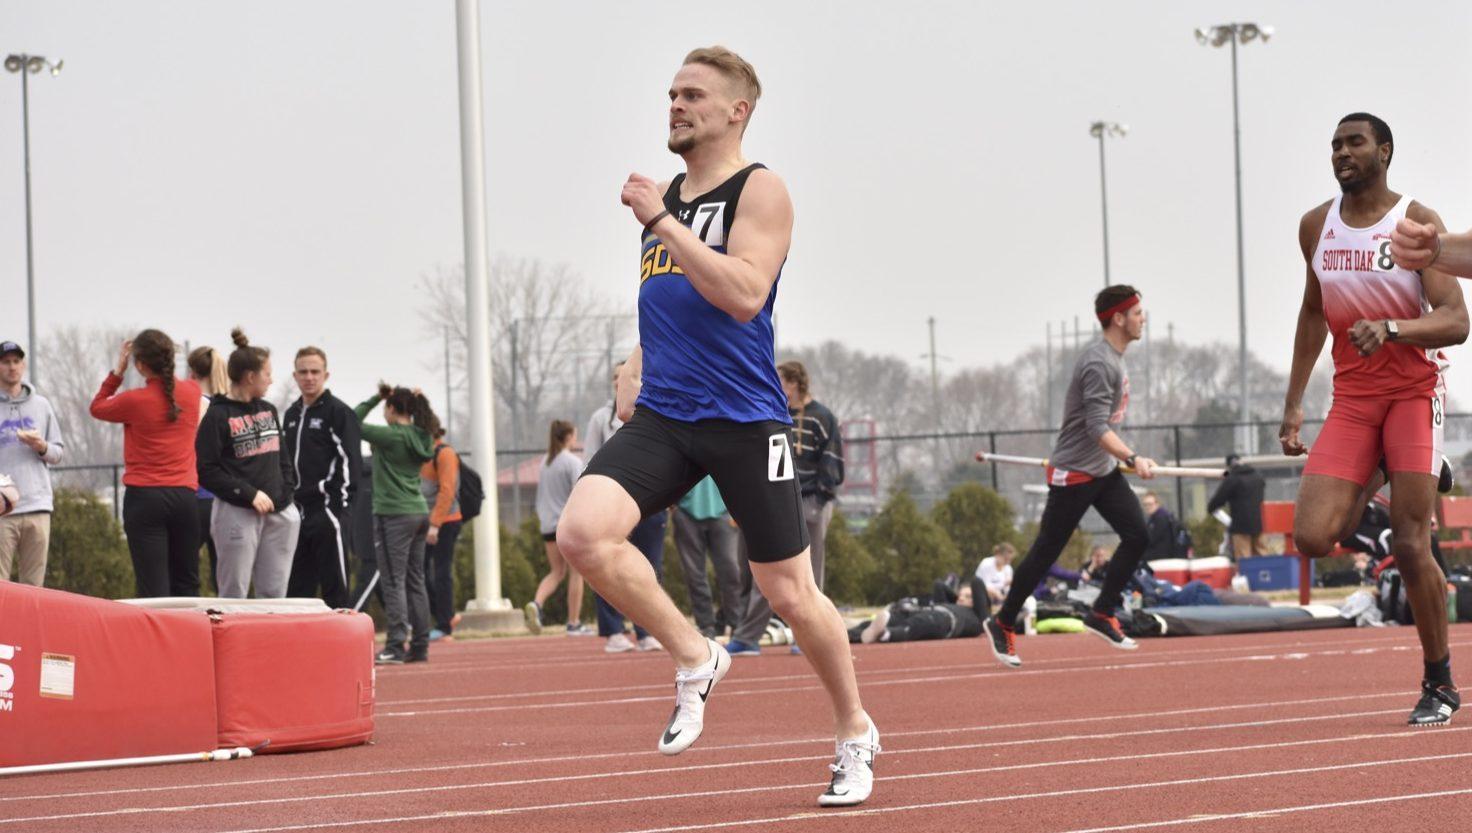 ABBY FULLENKAMP Junior Skyler Monaghan runs in the second heat of the men's 400 meter dash during the South Dakota Invitational meet April 10 at the University of South Dakota in Vermillion.